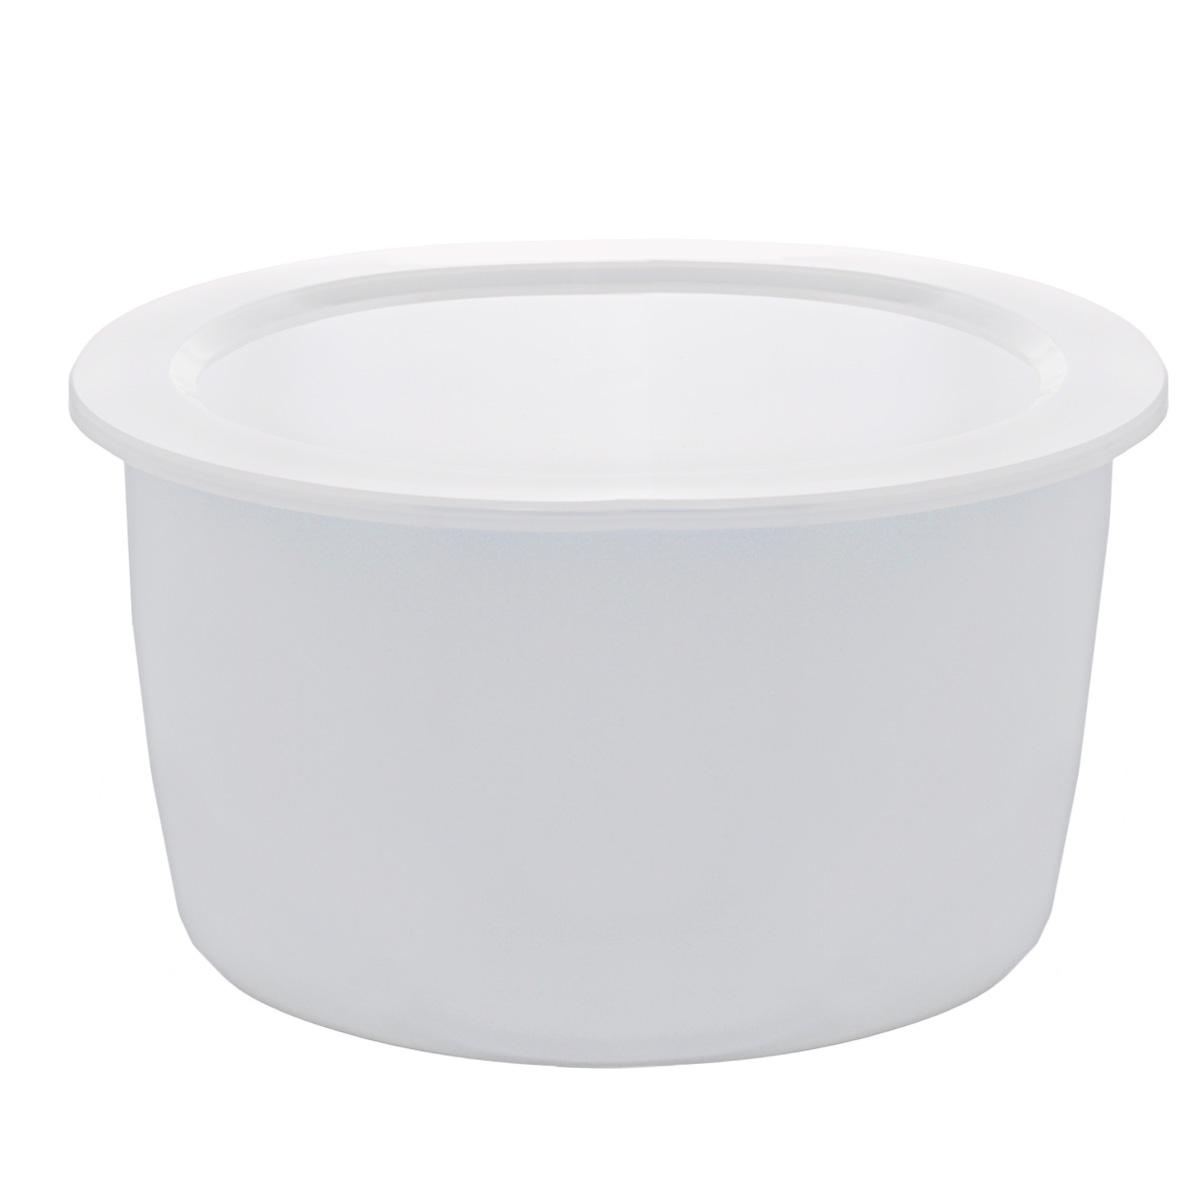 Steba AS 4 сменная чаша для мультиварки DD1/2